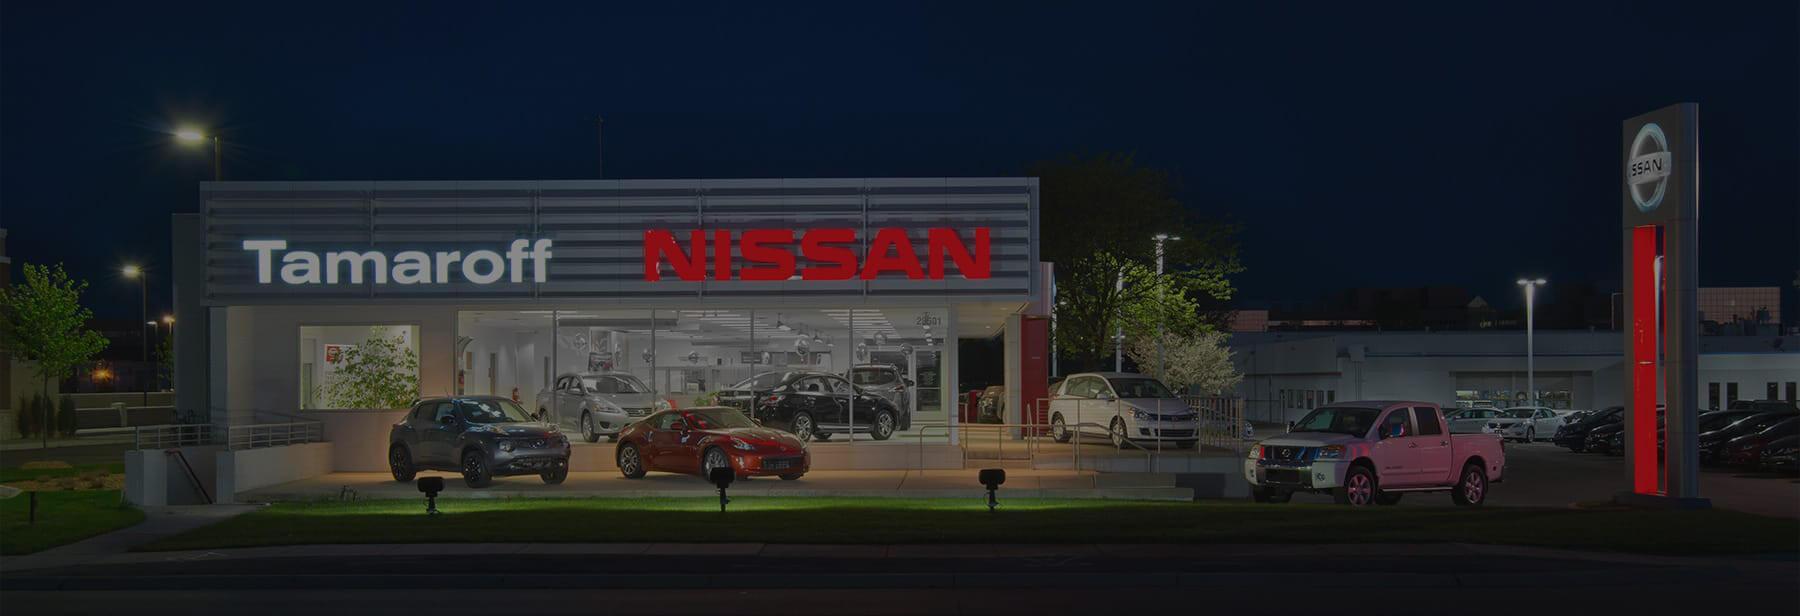 Tamaroff Nissan Dealership